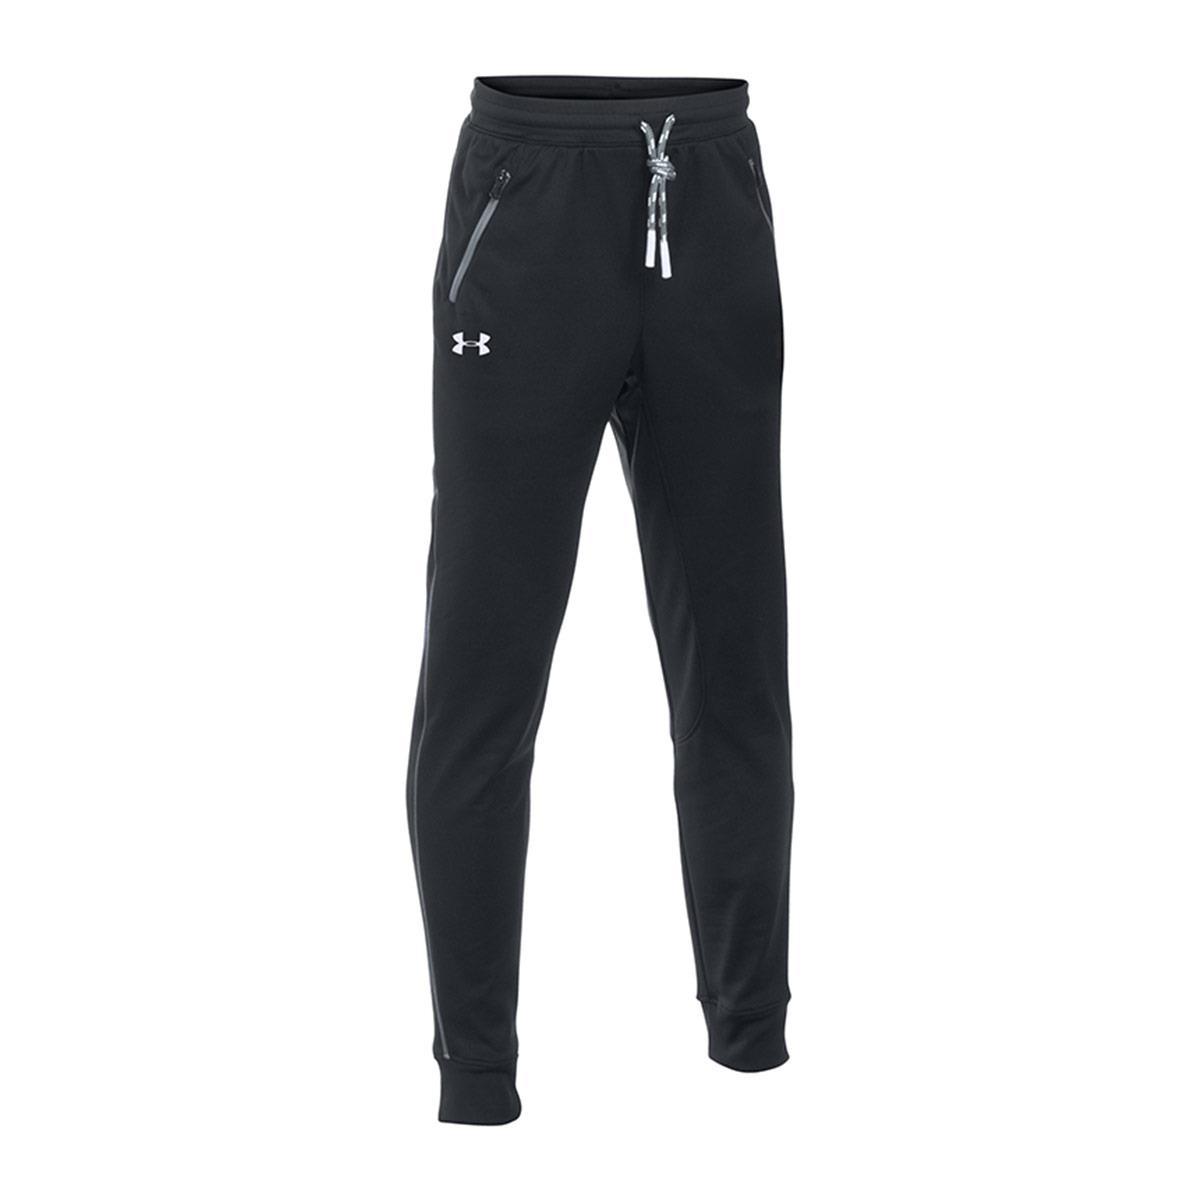 מכנסיי נוער אנדר ארמור  1281072-001 Under Armour Boys'  Pennant Tapered Trousers